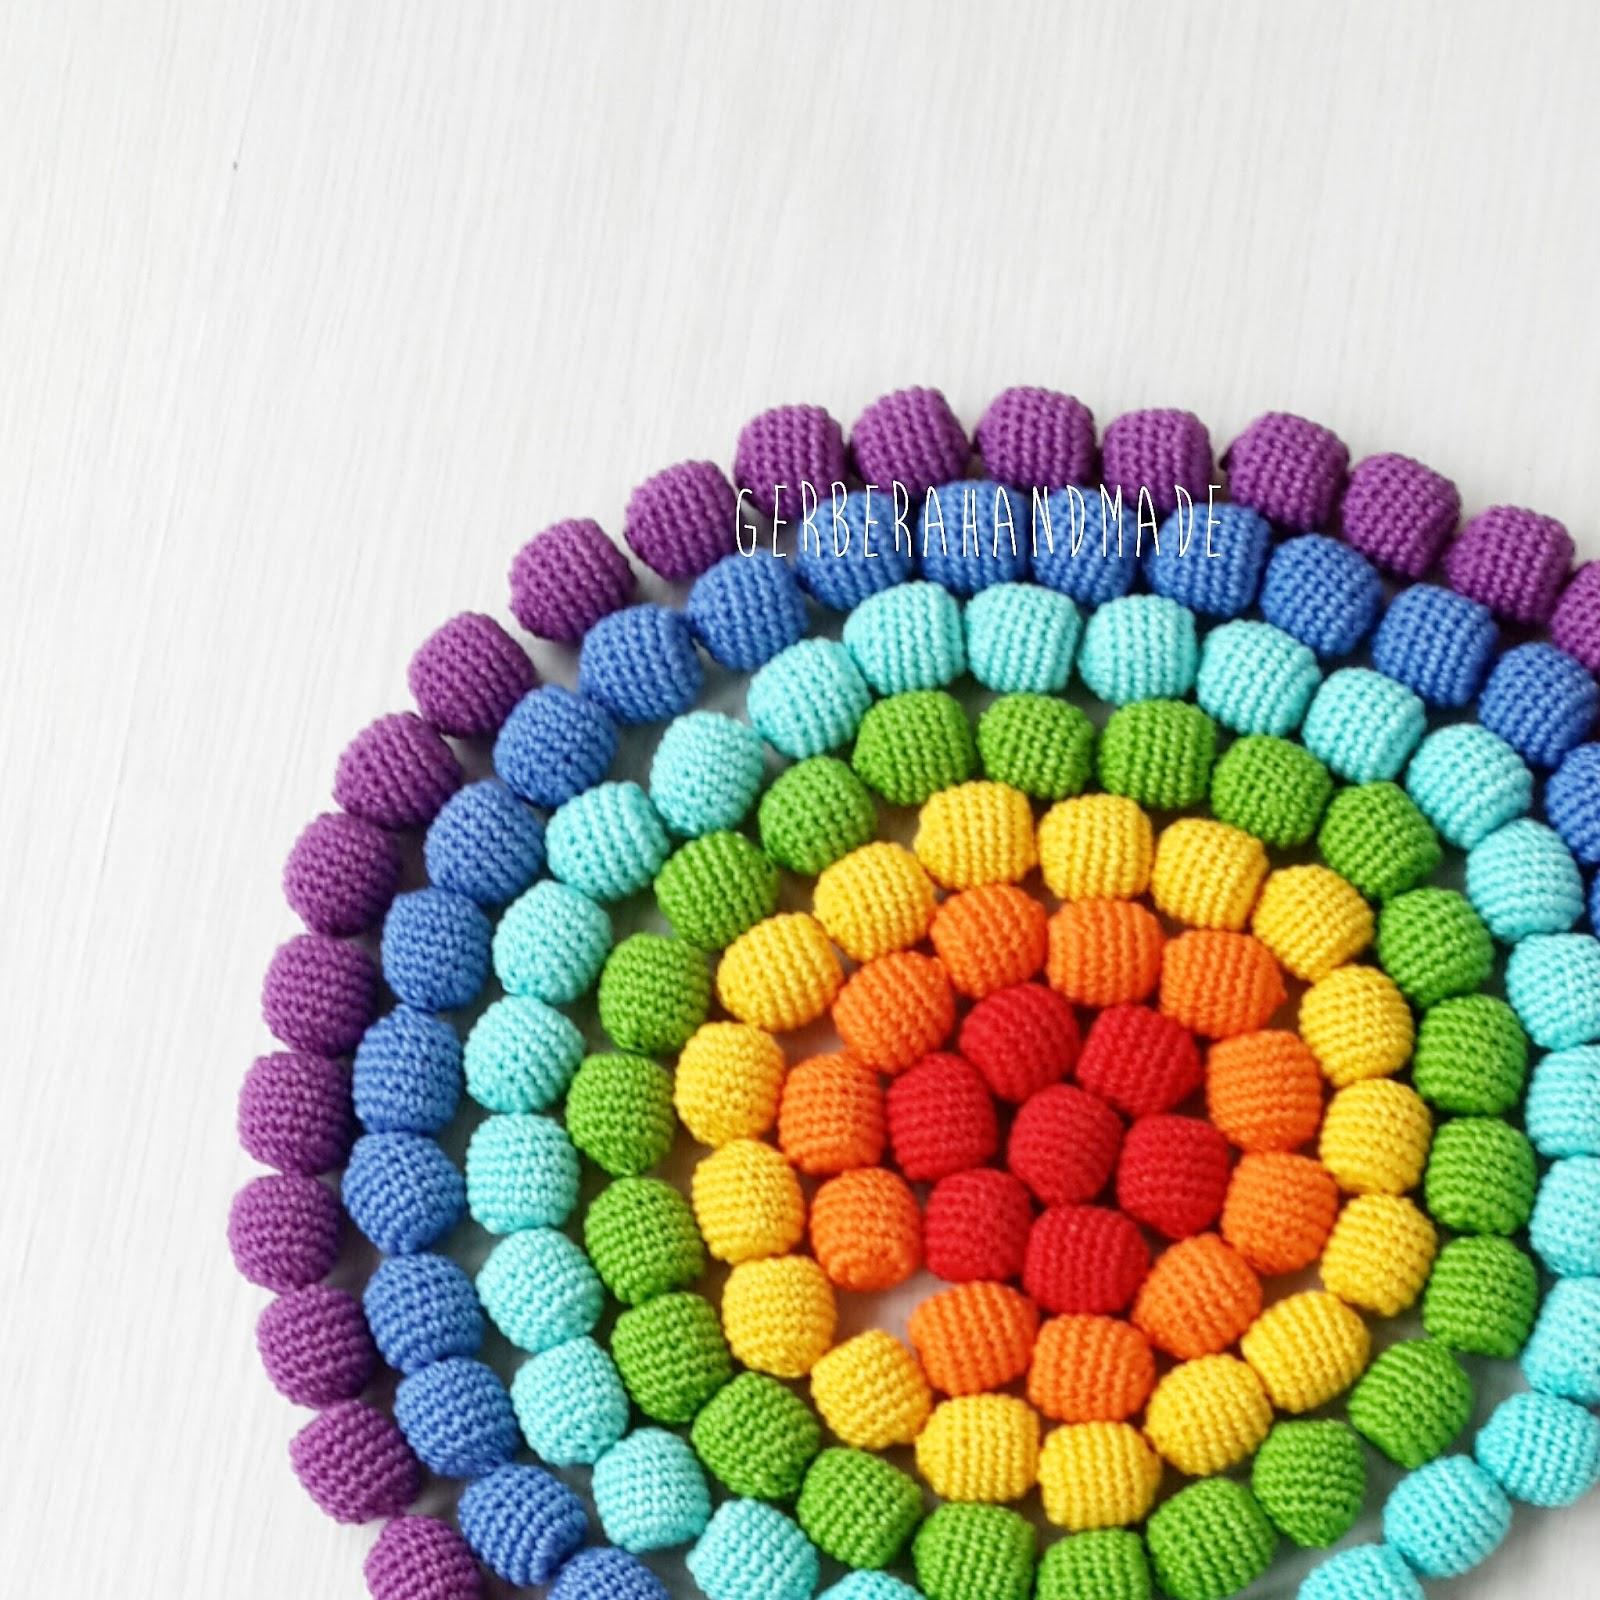 rainbow, necklace, beads, crochet bead, радуга, слингобусы, радужные слингобусы, купить слингобусы